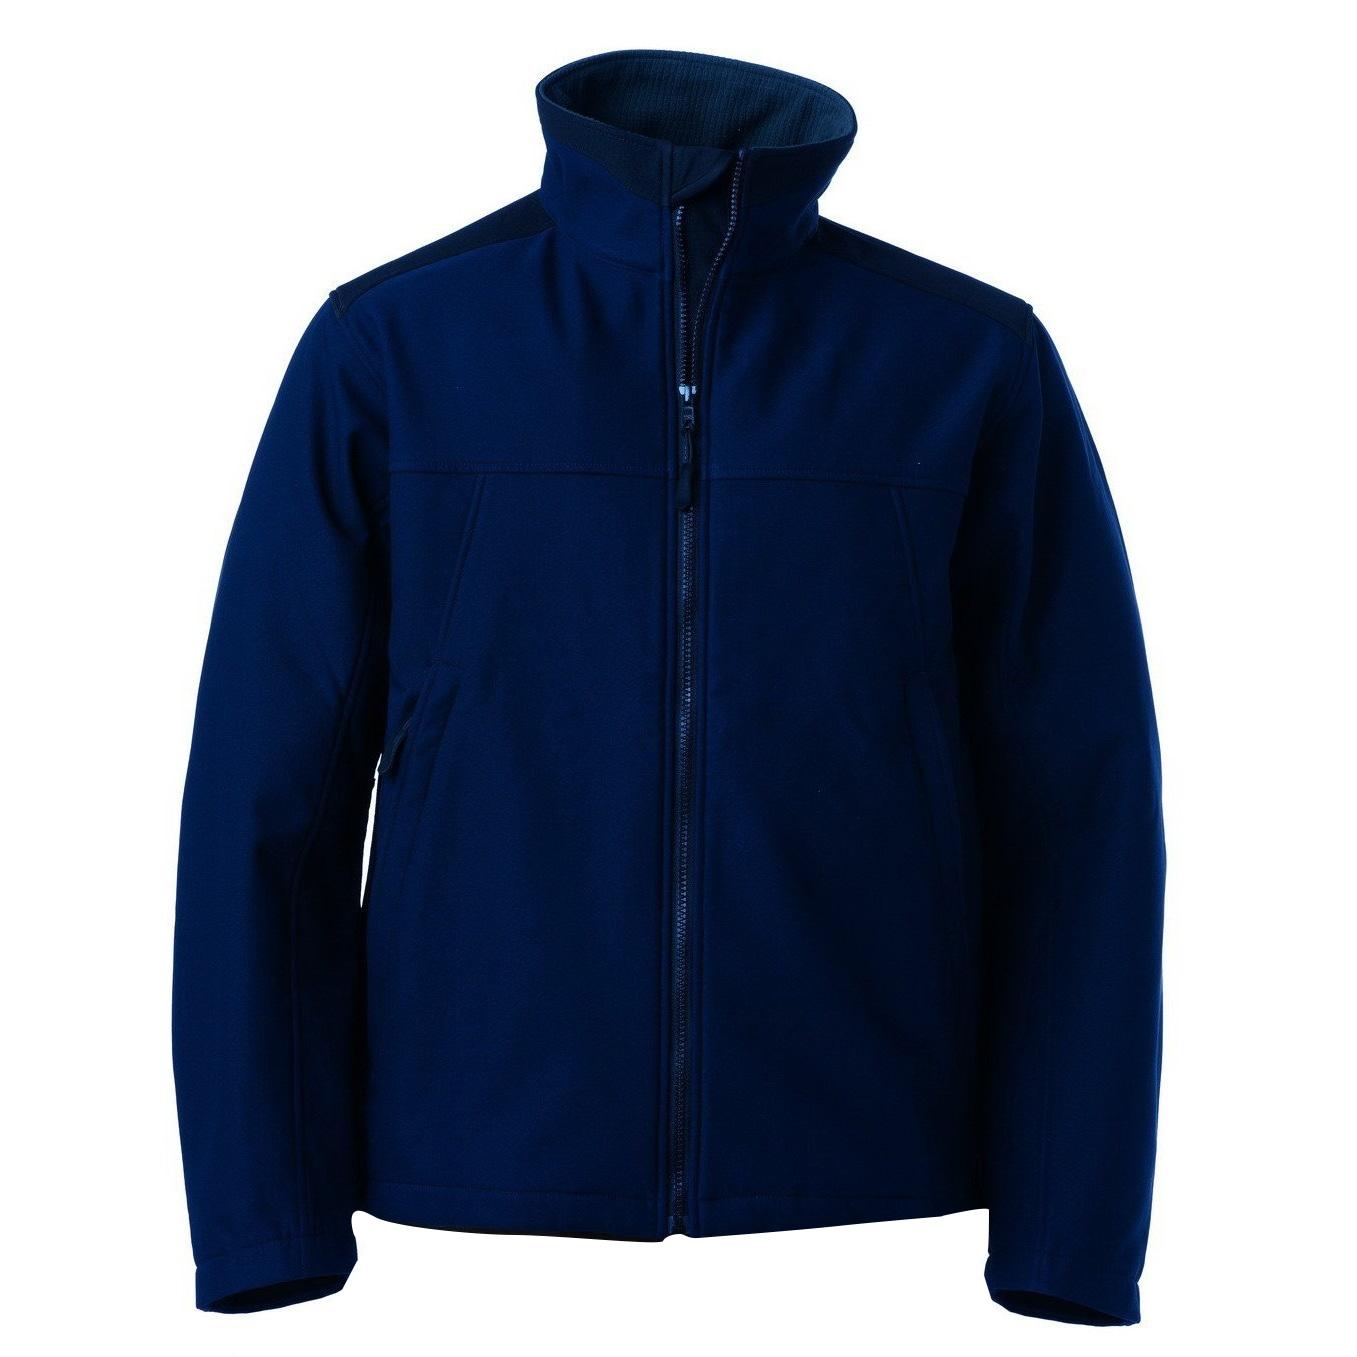 Russell Softshelljacke Workwear Herren Softshell Membran-Jacke wasserabweisend atmungsaktiv   Sportbekleidung > Sportjacken   Blau   Nylon - Fleece